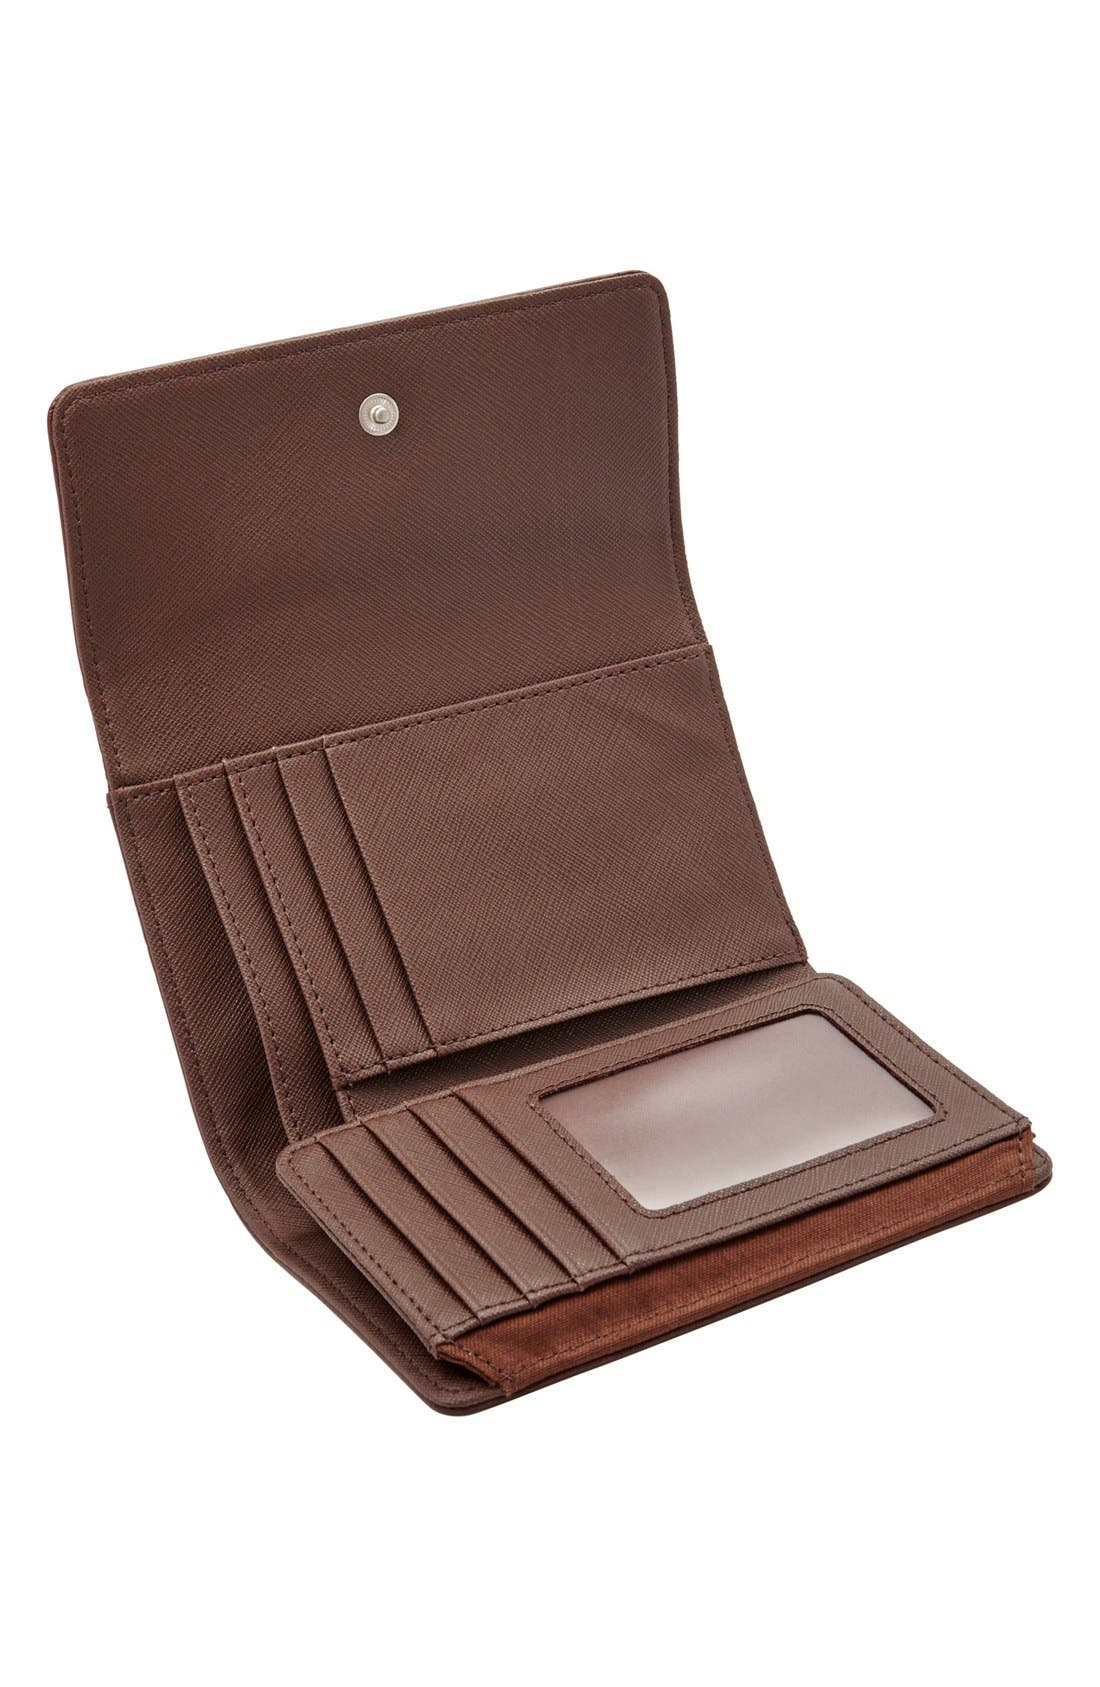 Alternate Image 2  - Fossil 'Dawson' Flap Wallet